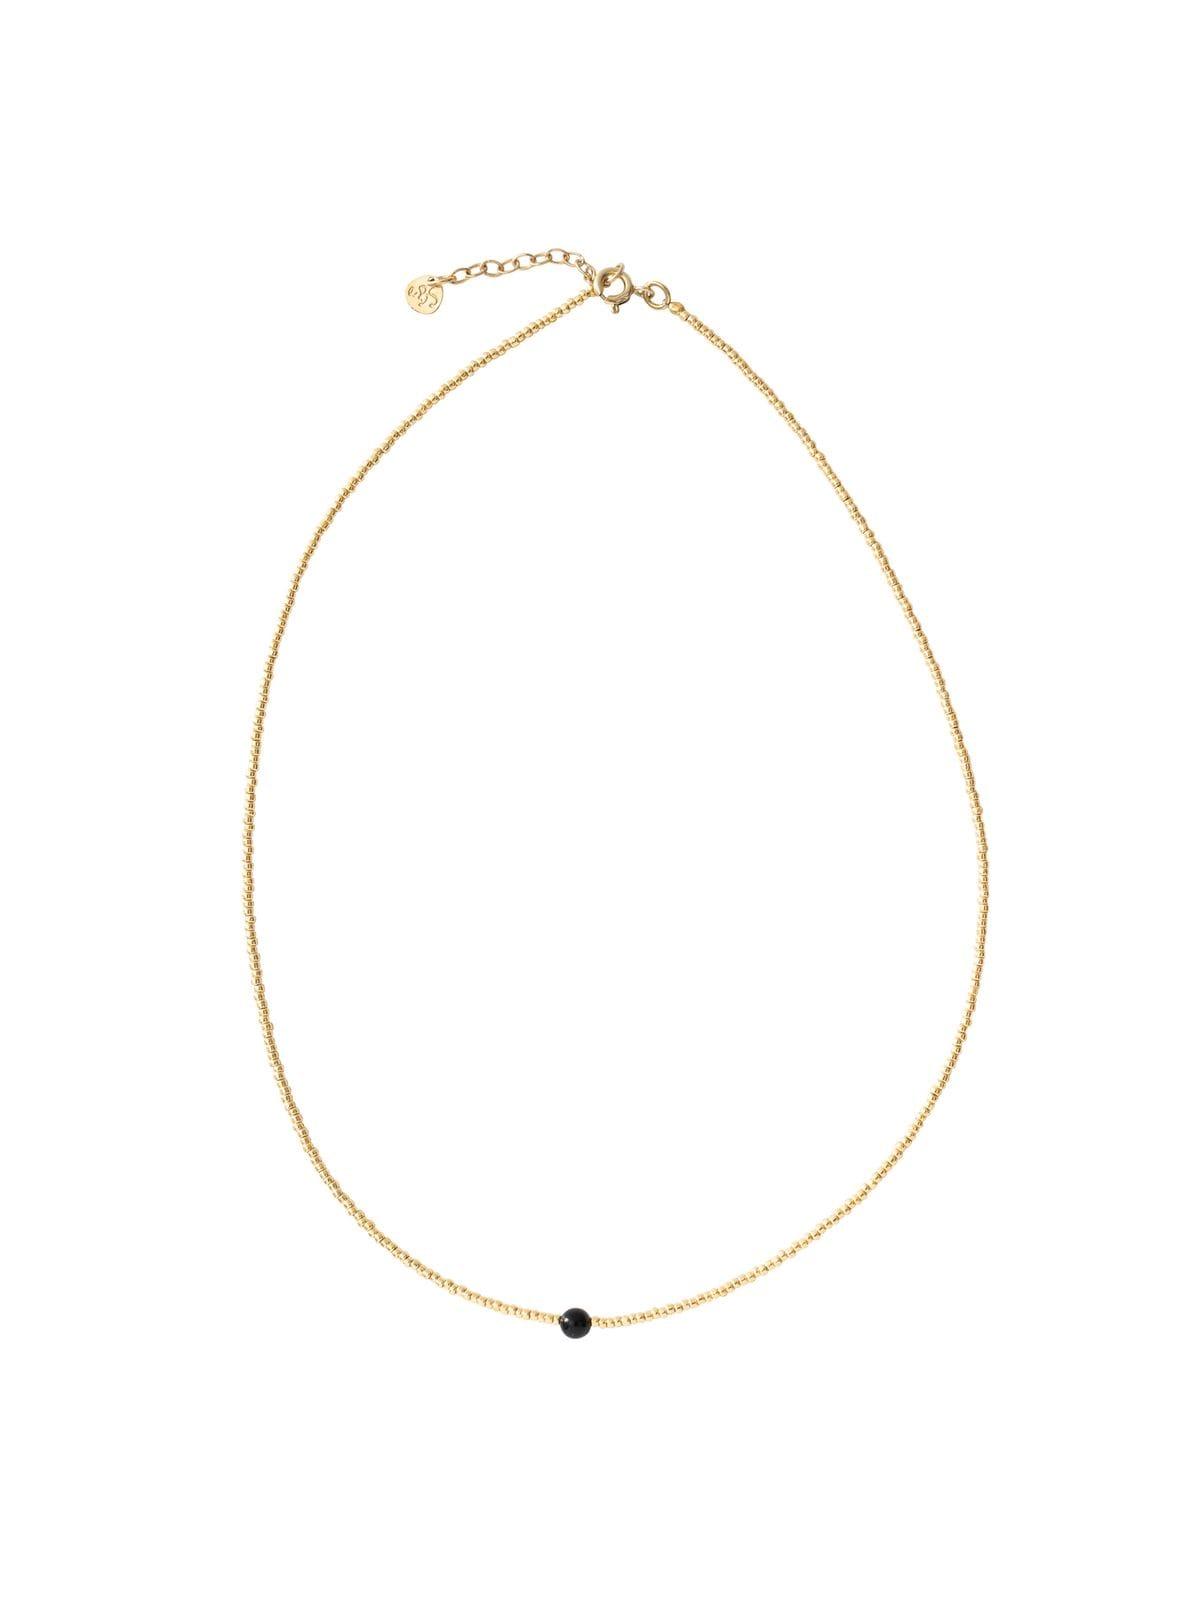 BL24380_2 - Flora Black Onyx Gold Necklace_1200x1600